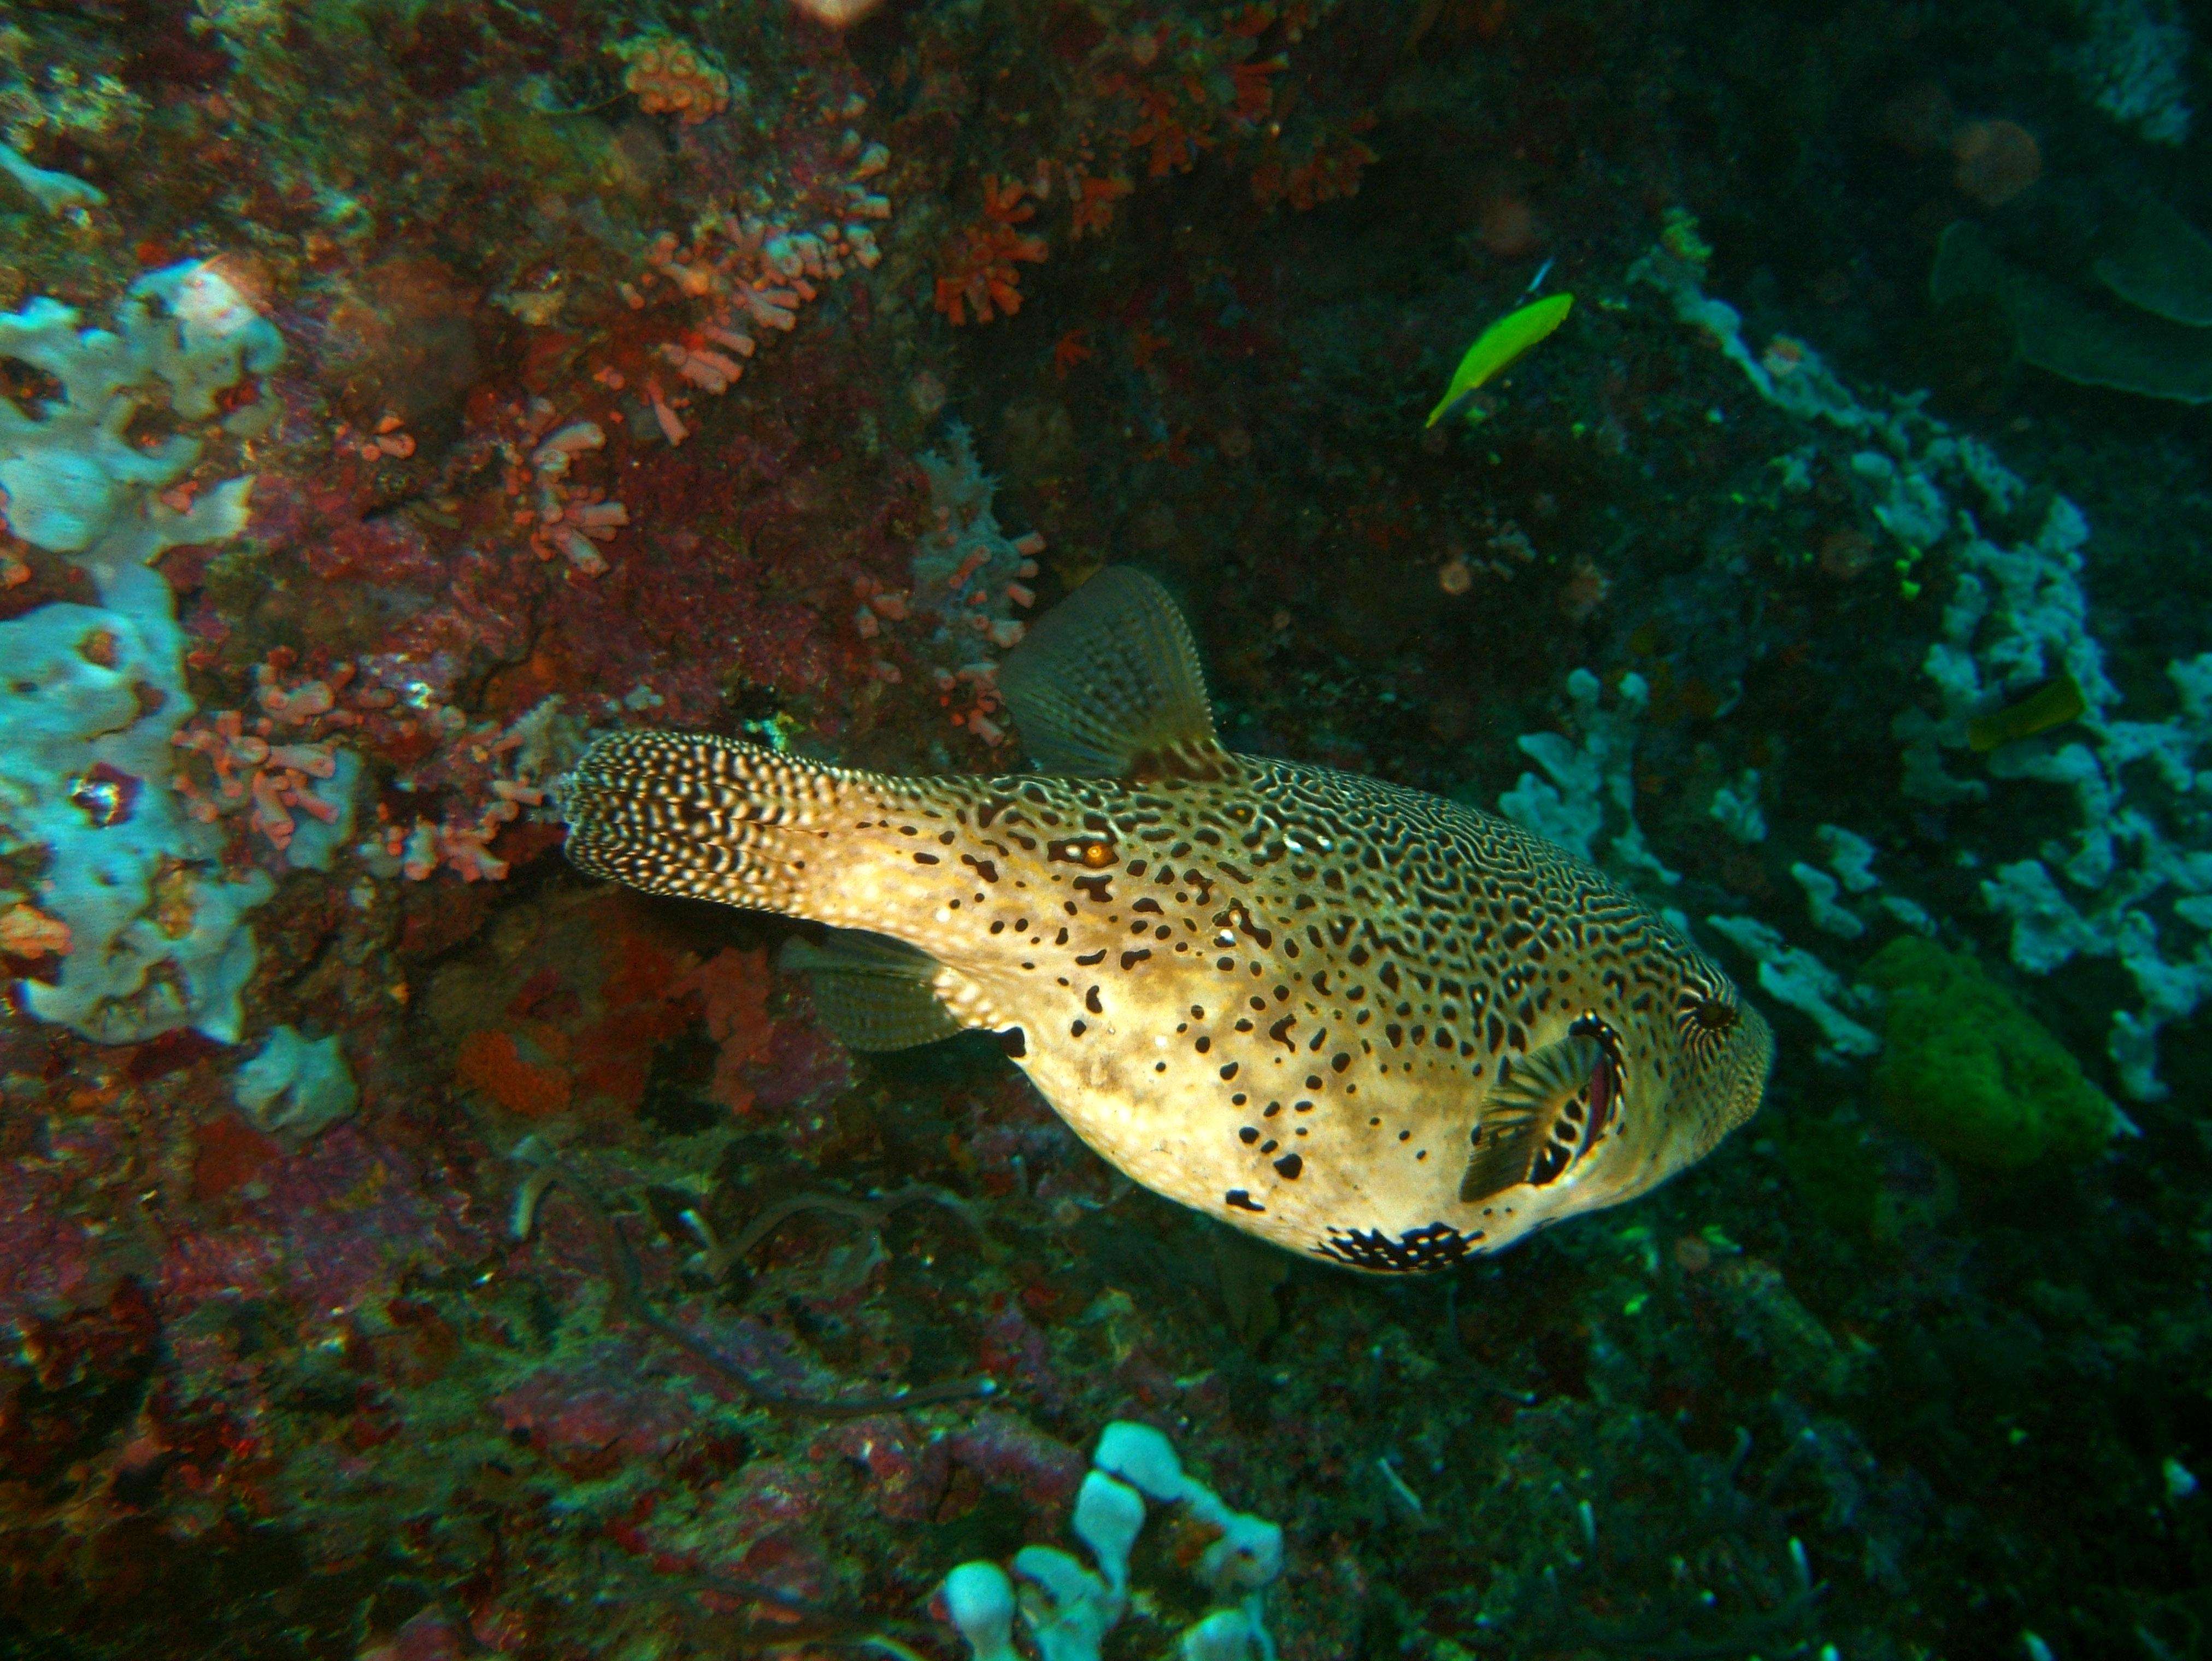 Philippines Cebu Moal Boal 20051227 Dive 1 Pescador Island 53